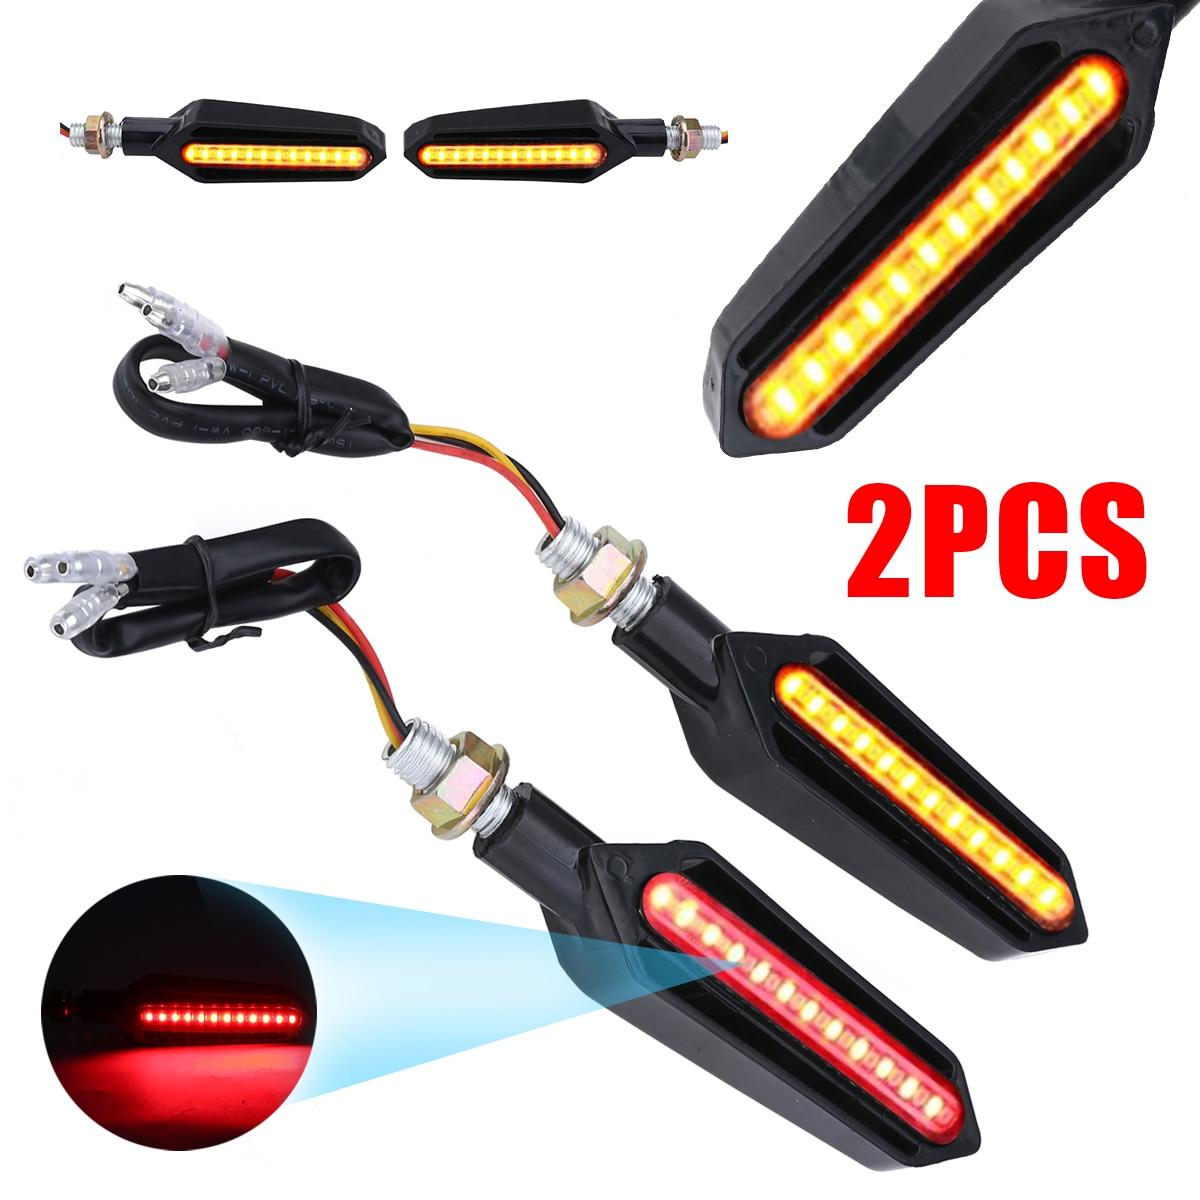 Red LED Indicator Light 2 Pcs Motorcycle Amber Flowing LED Turn Signal Light